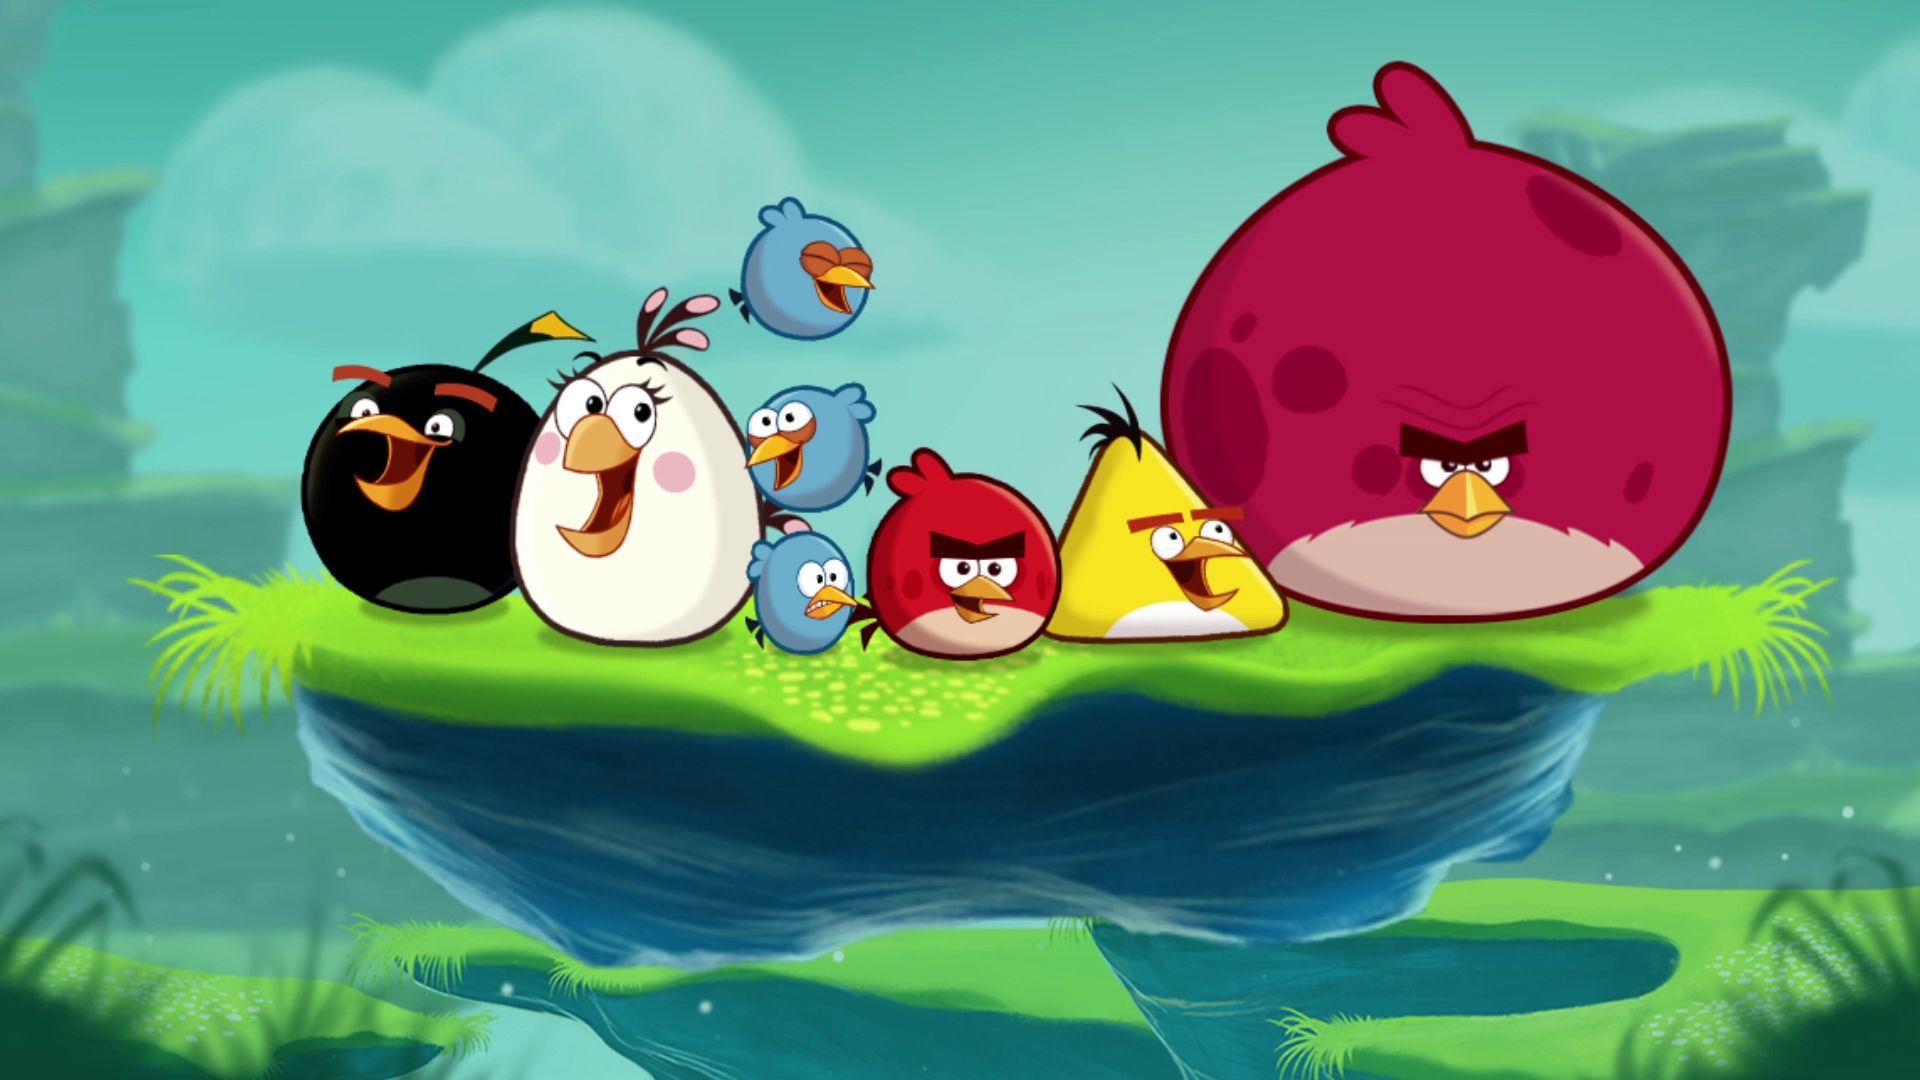 Akusisi Studio Game Pengembang Angry Birds Ingin Ciptakan Game Baru